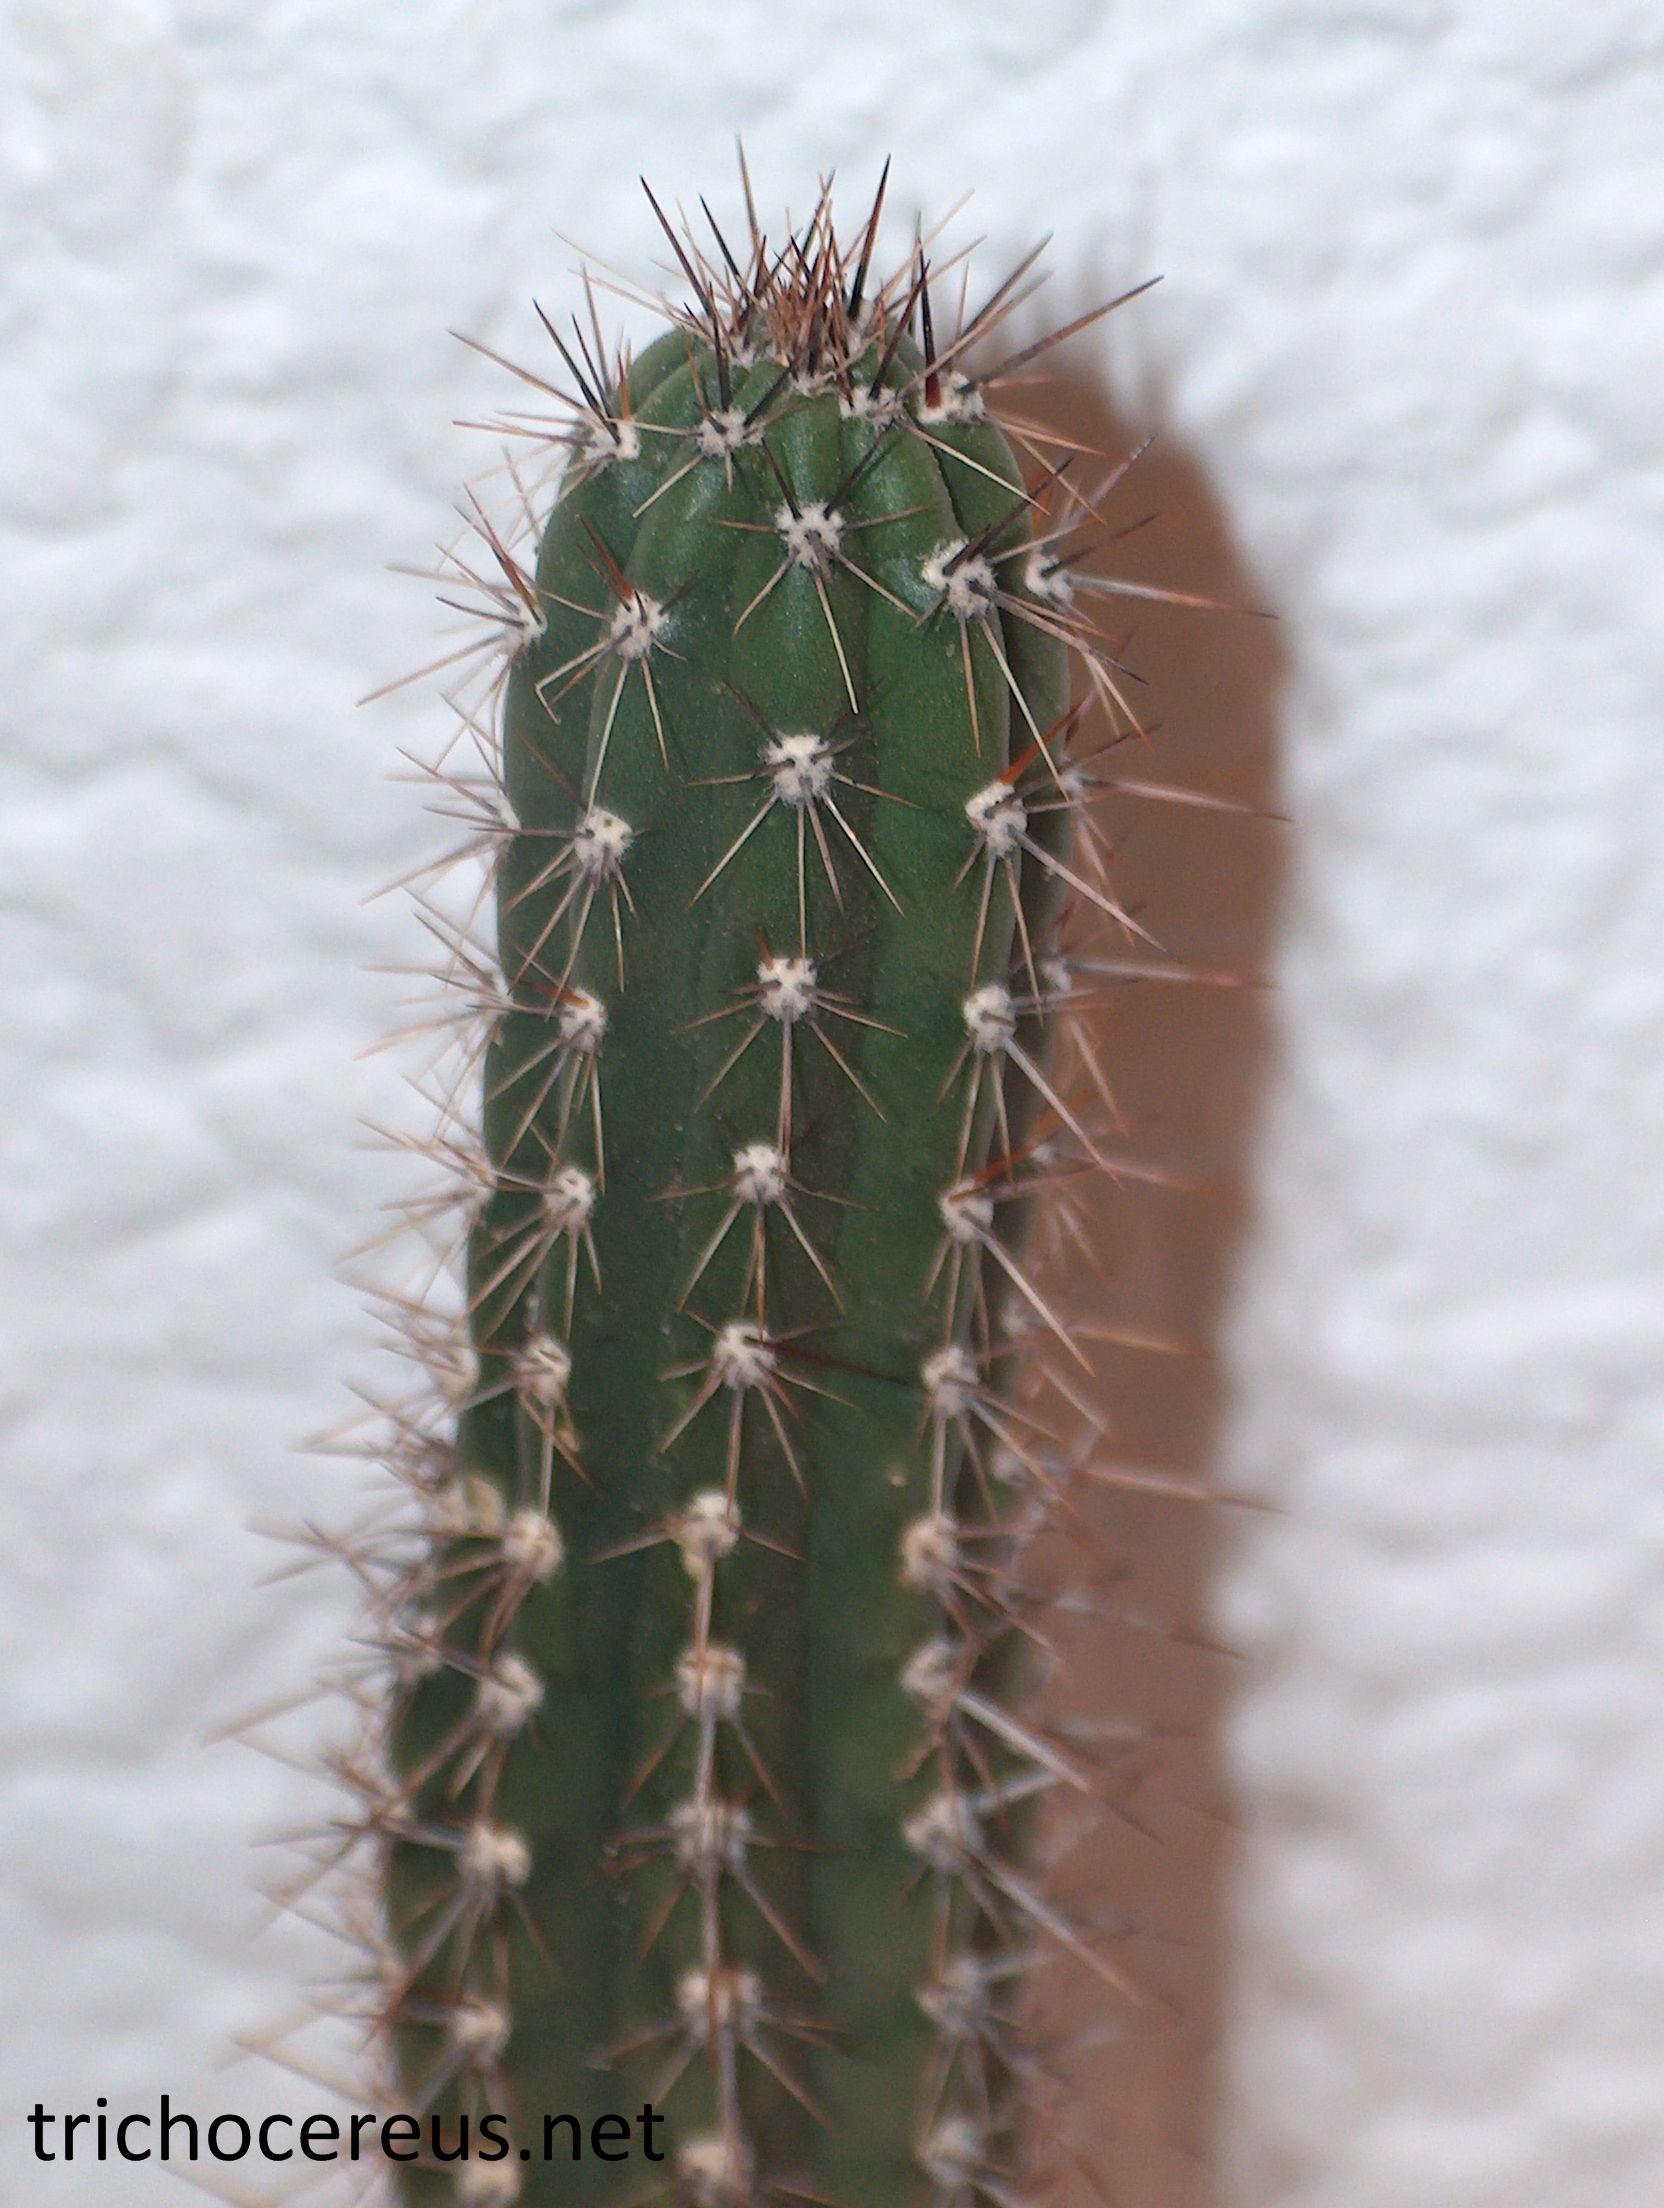 Trichocereus Lamprochlorus 3 (Echinopsis)